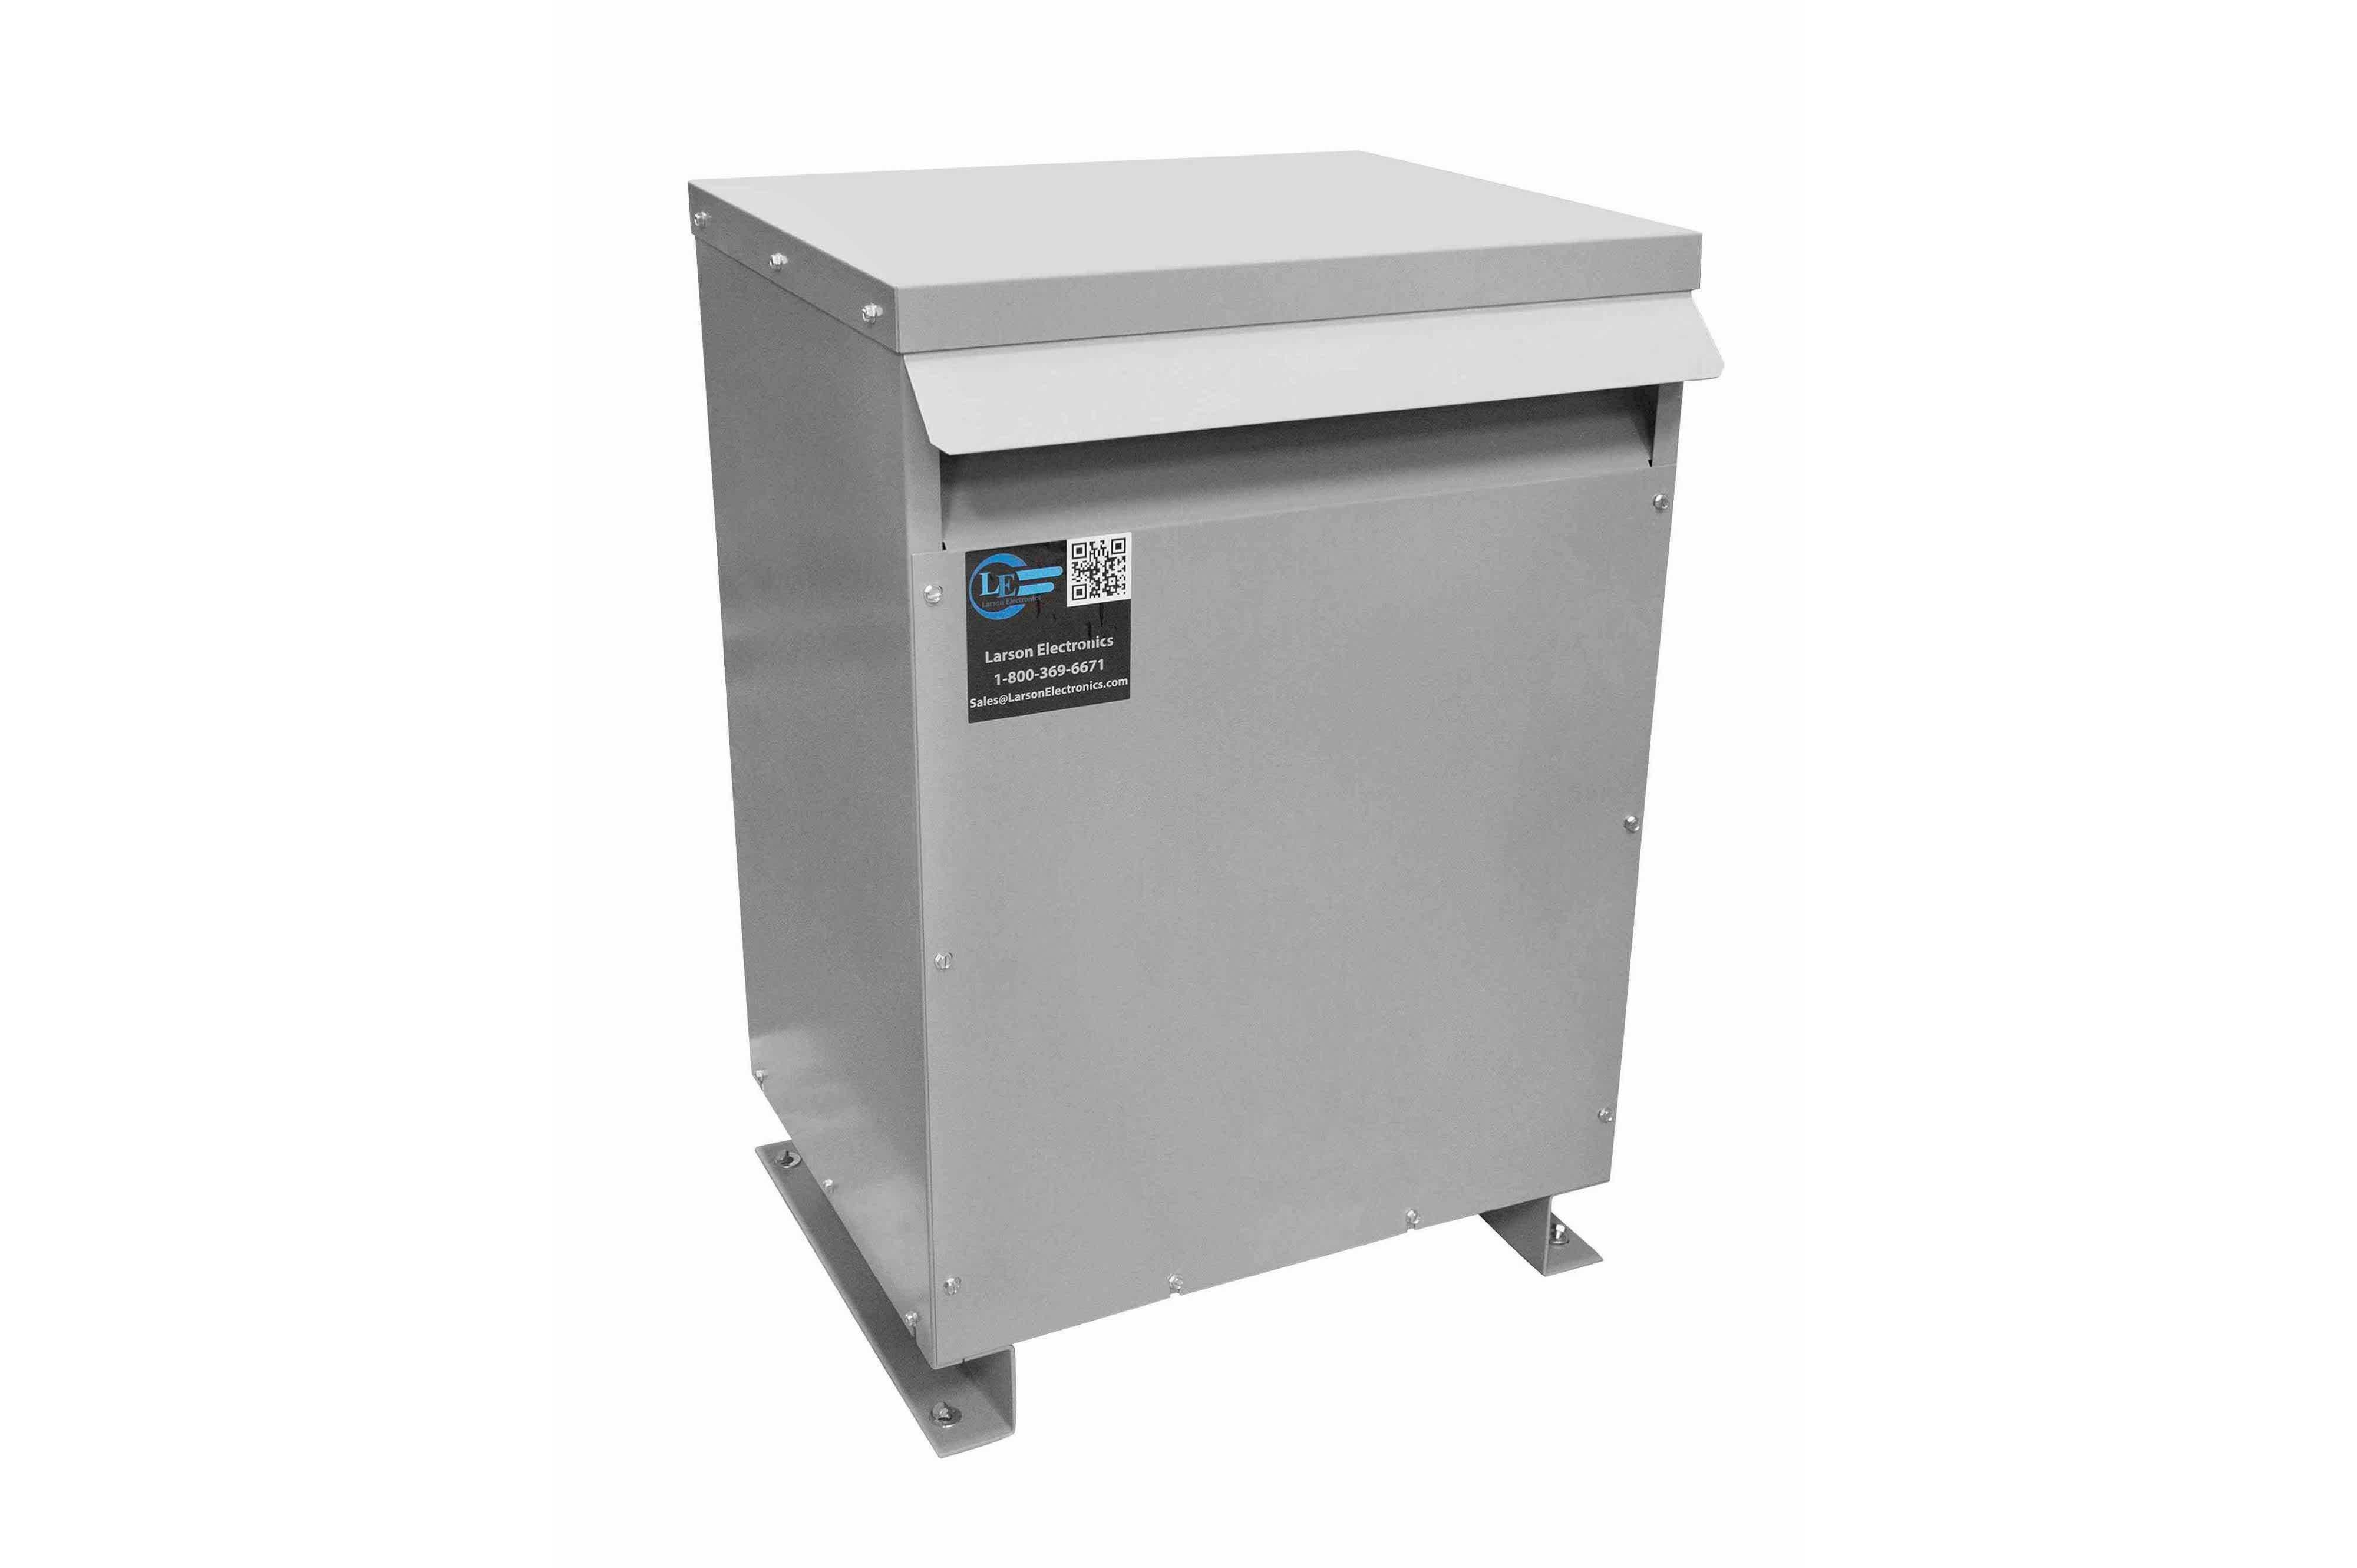 300 kVA 3PH DOE Transformer, 460V Delta Primary, 415Y/240 Wye-N Secondary, N3R, Ventilated, 60 Hz